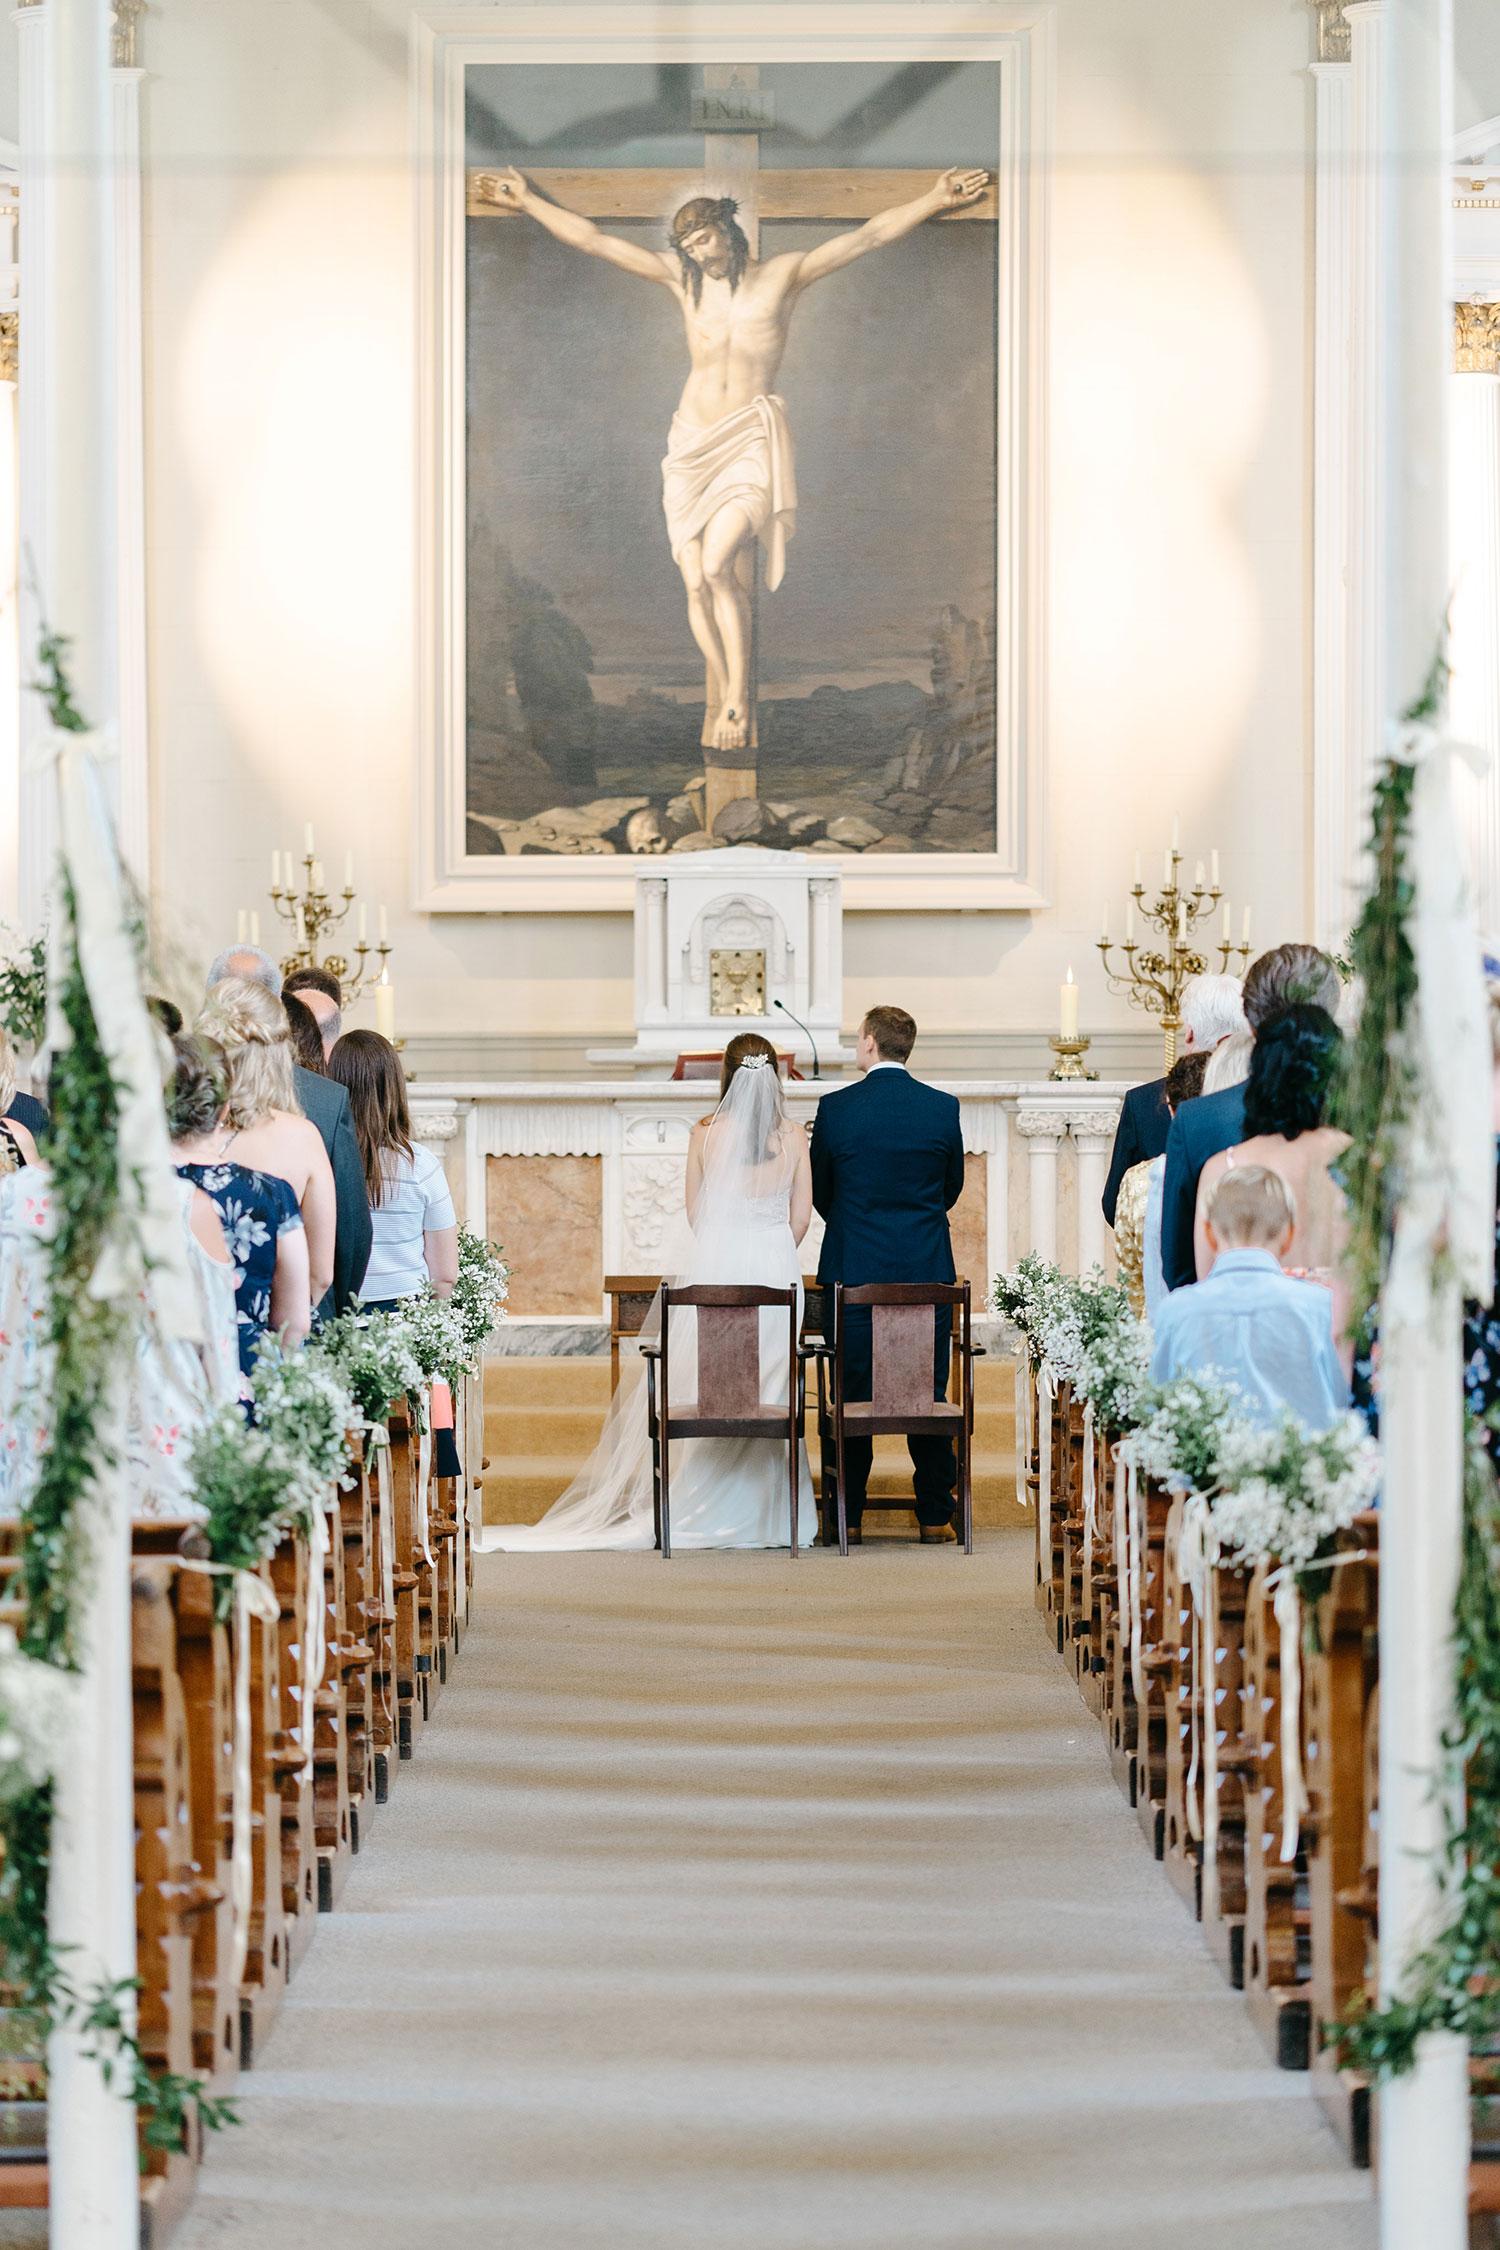 destination-wedding-photographer-ballinacurra-house-wedding-20180711_0027.jpg